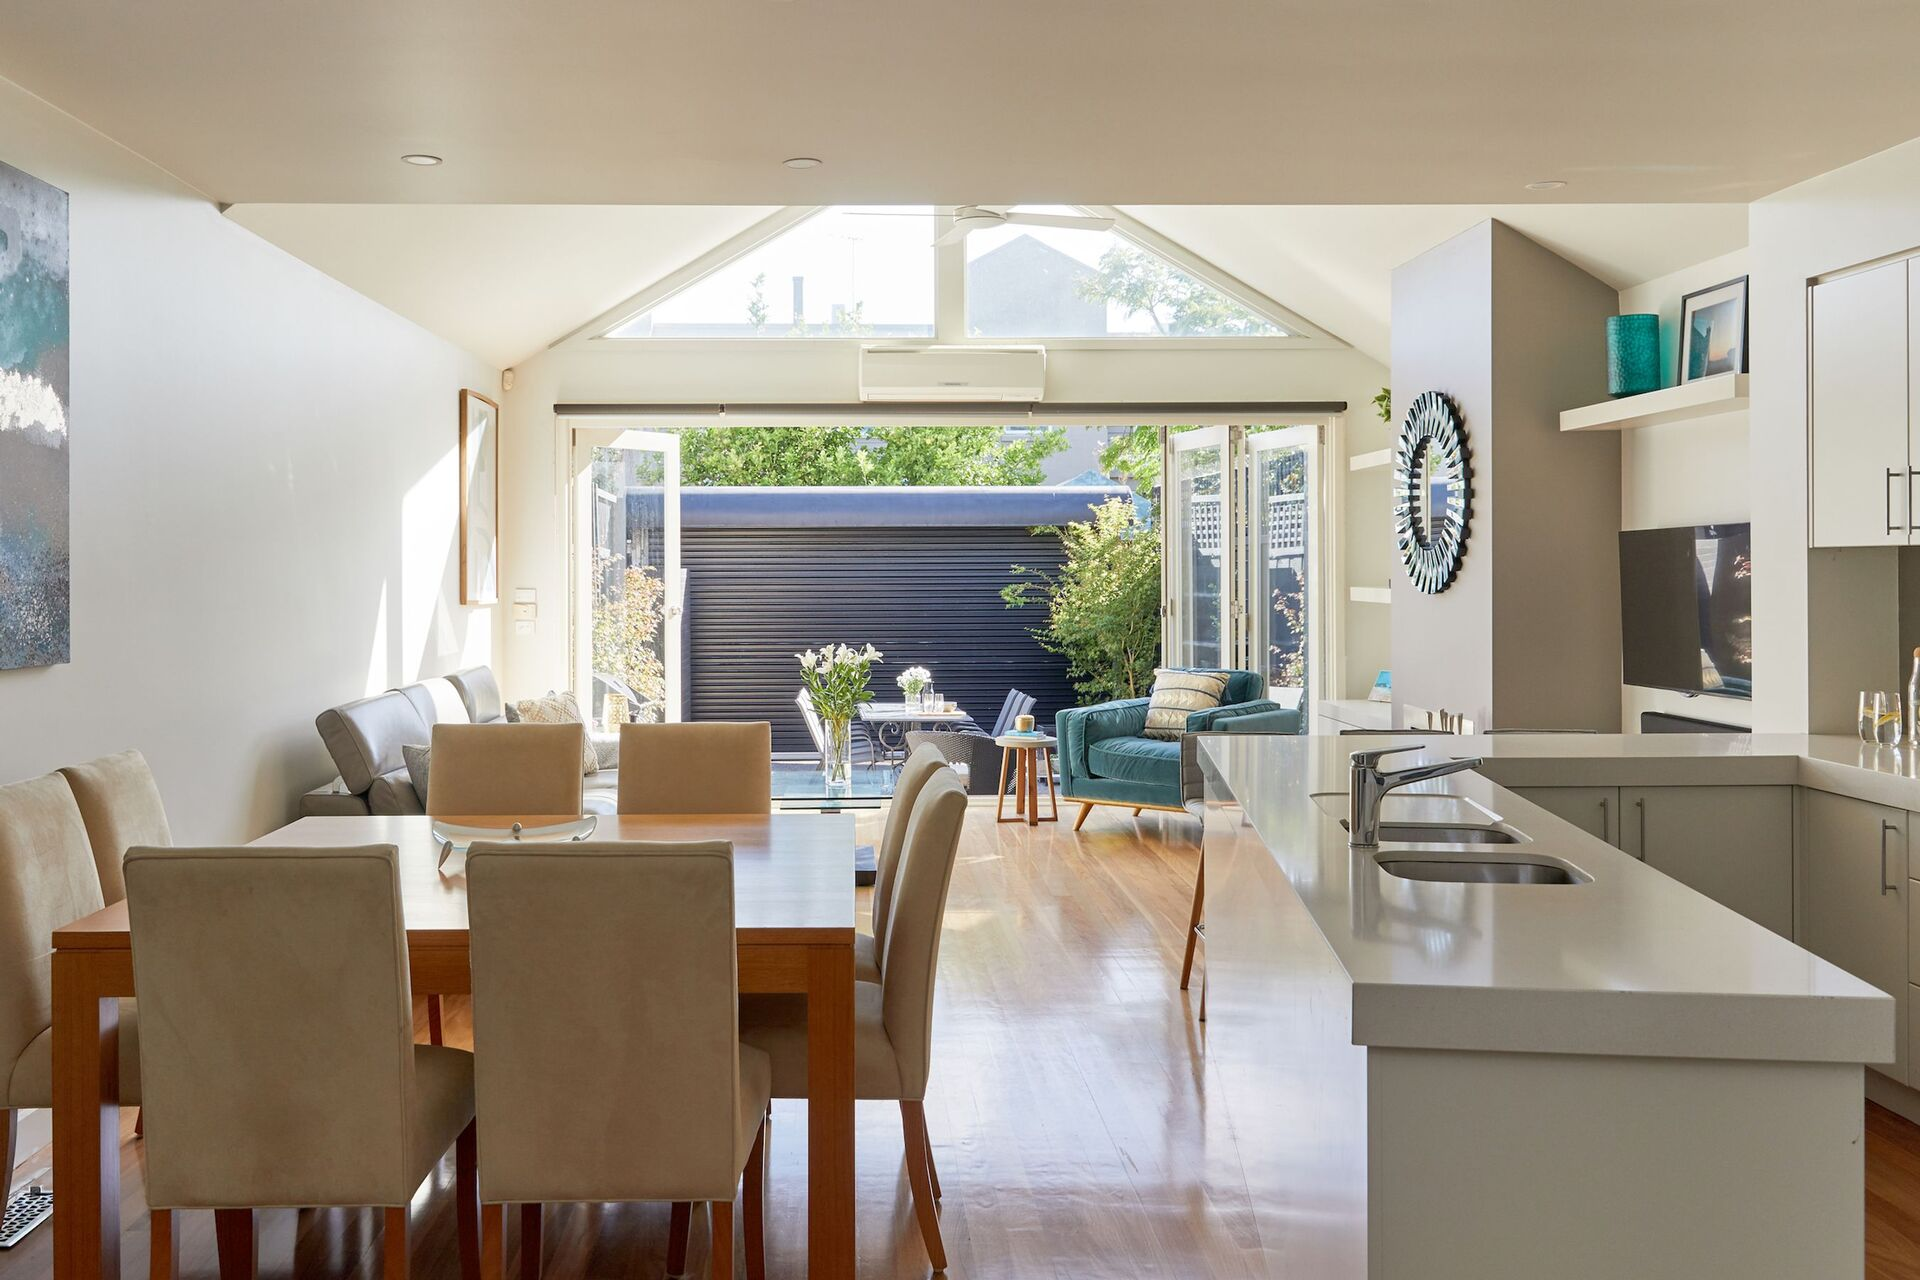 the spacious open plan kitchen / dining area